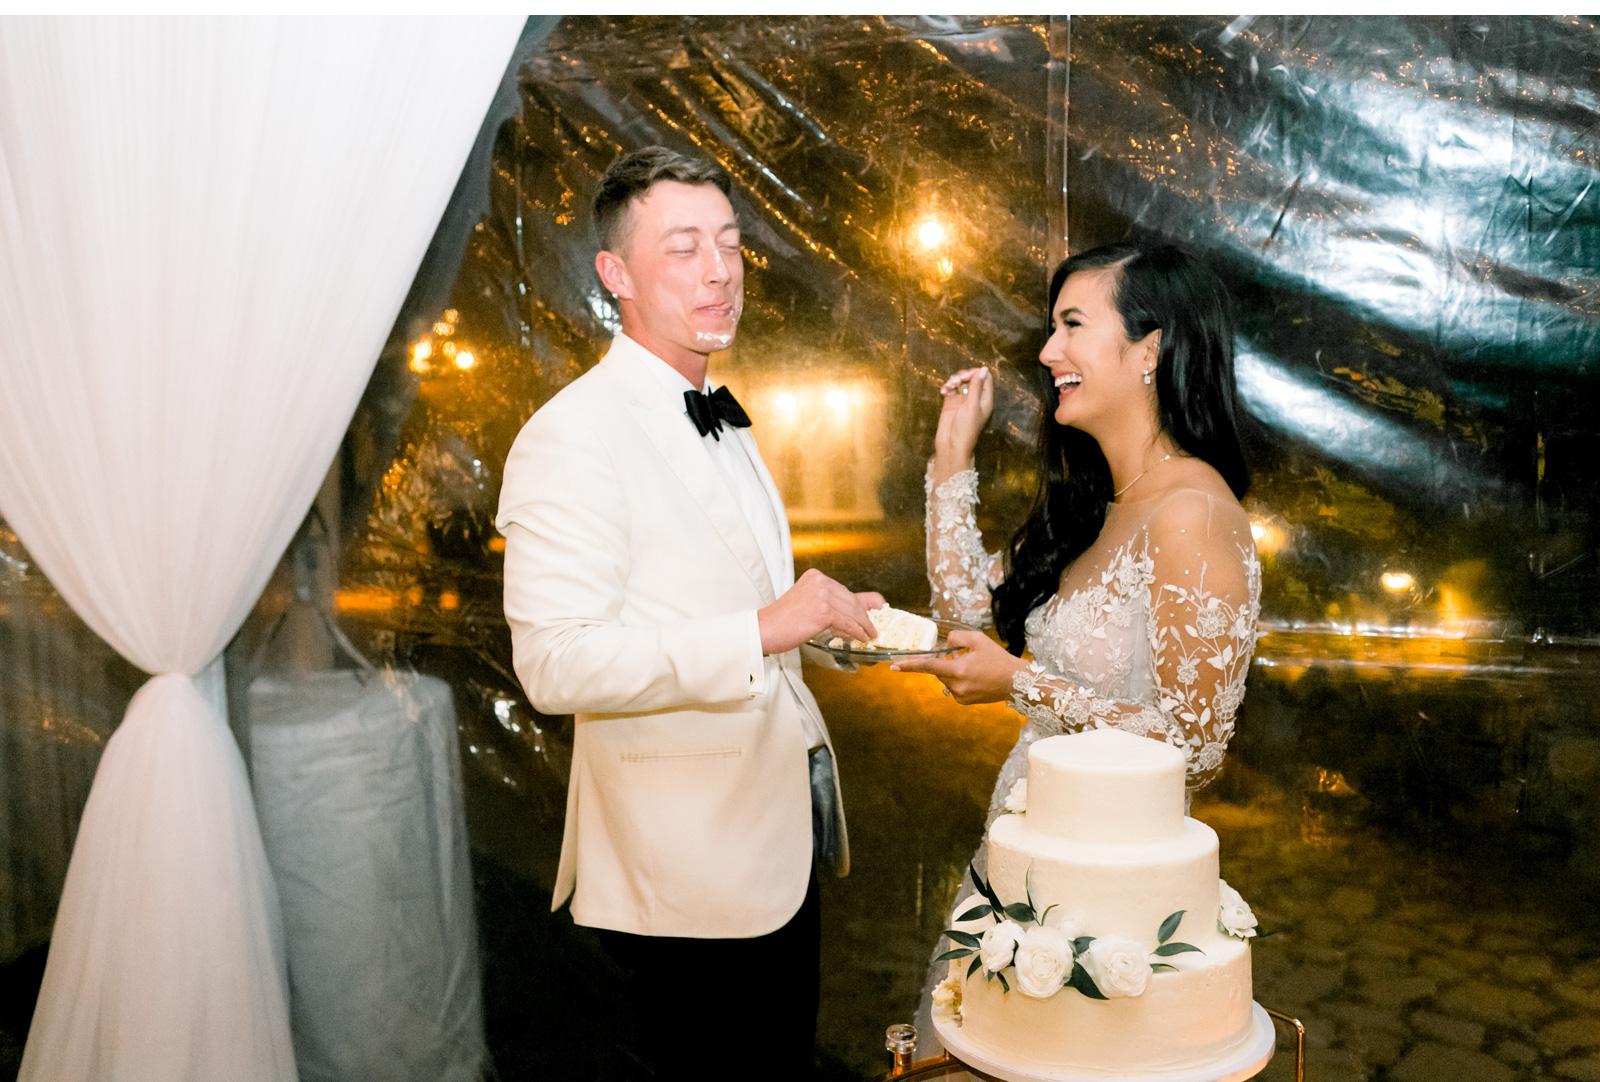 West-Coast-Wedding-Photographer-Style-Me-Pretty-Malibu-Weddings-Fine-Art-Wedding-Photography-Natalie-Schutt-Photography_06.jpg